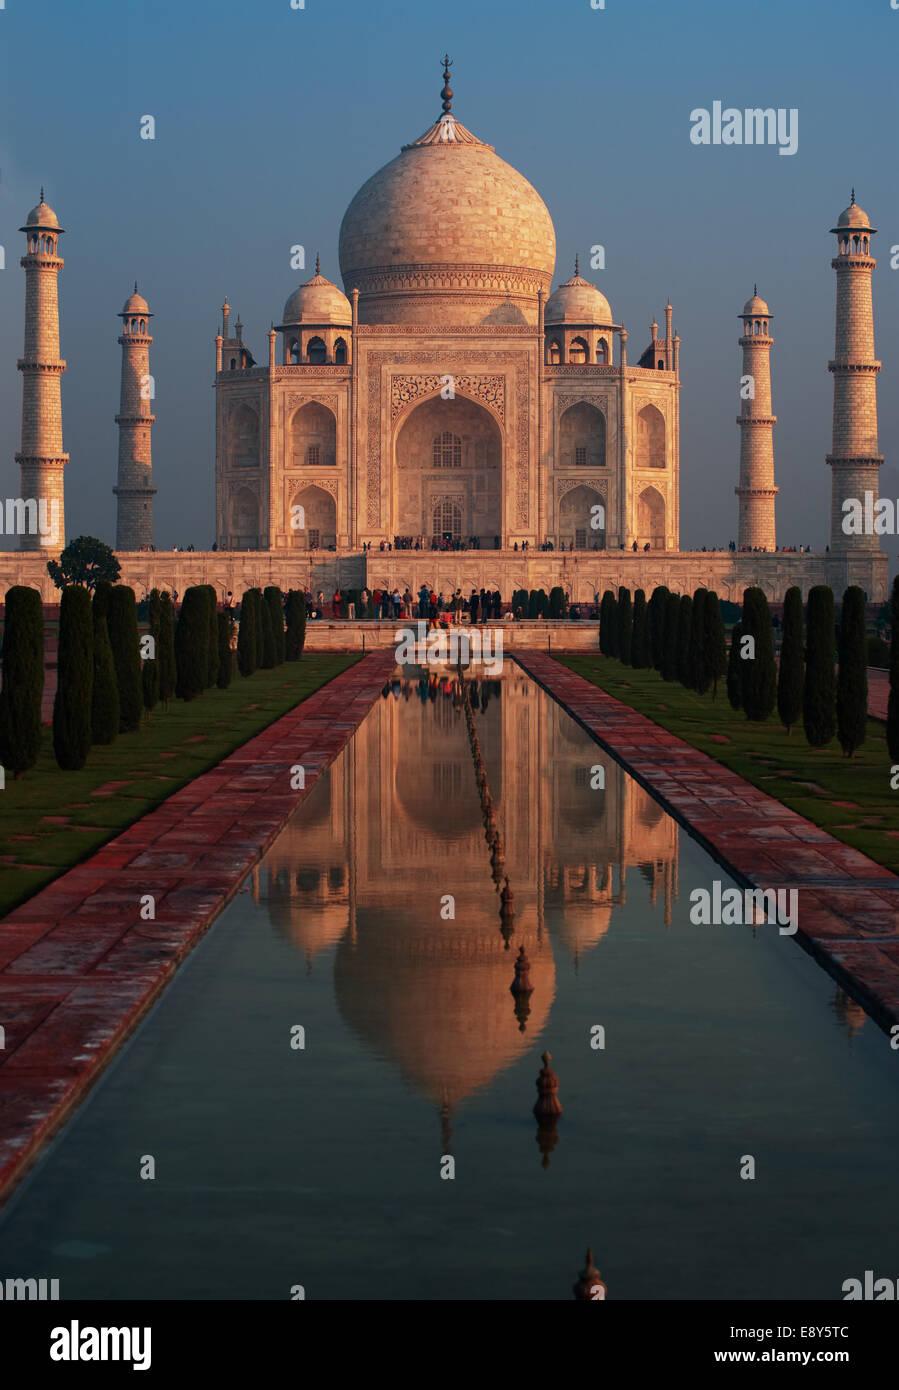 Taj Mahal Sunrise Fountain Reflection - Stock Image